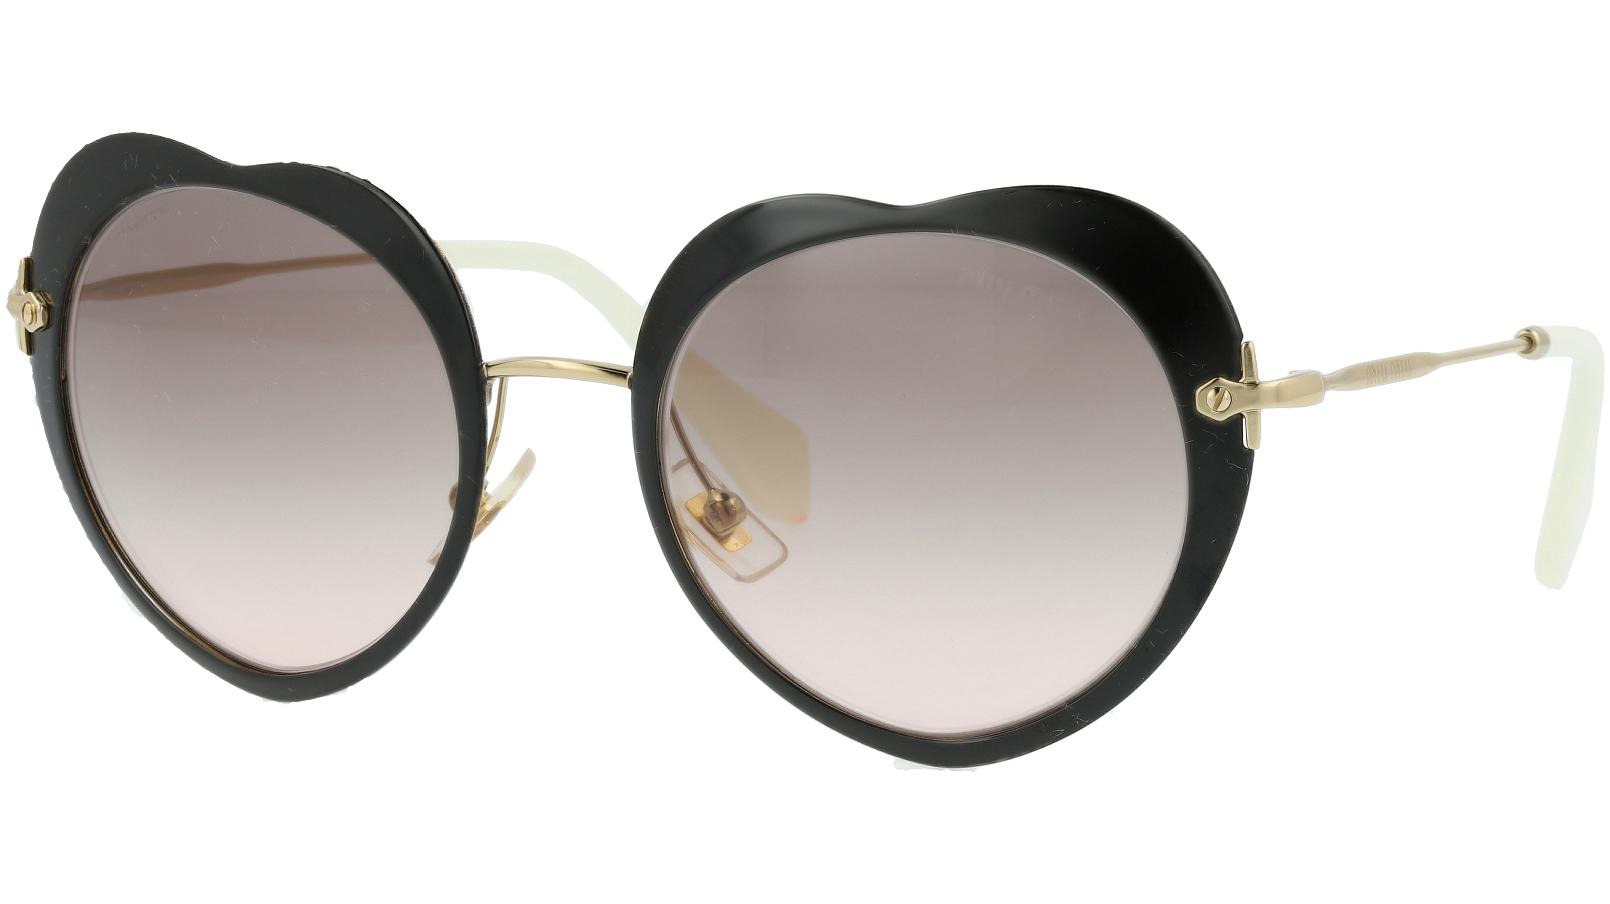 Miu Miu MU54RS 1AB4K0 52 Black Heart Sunglasses